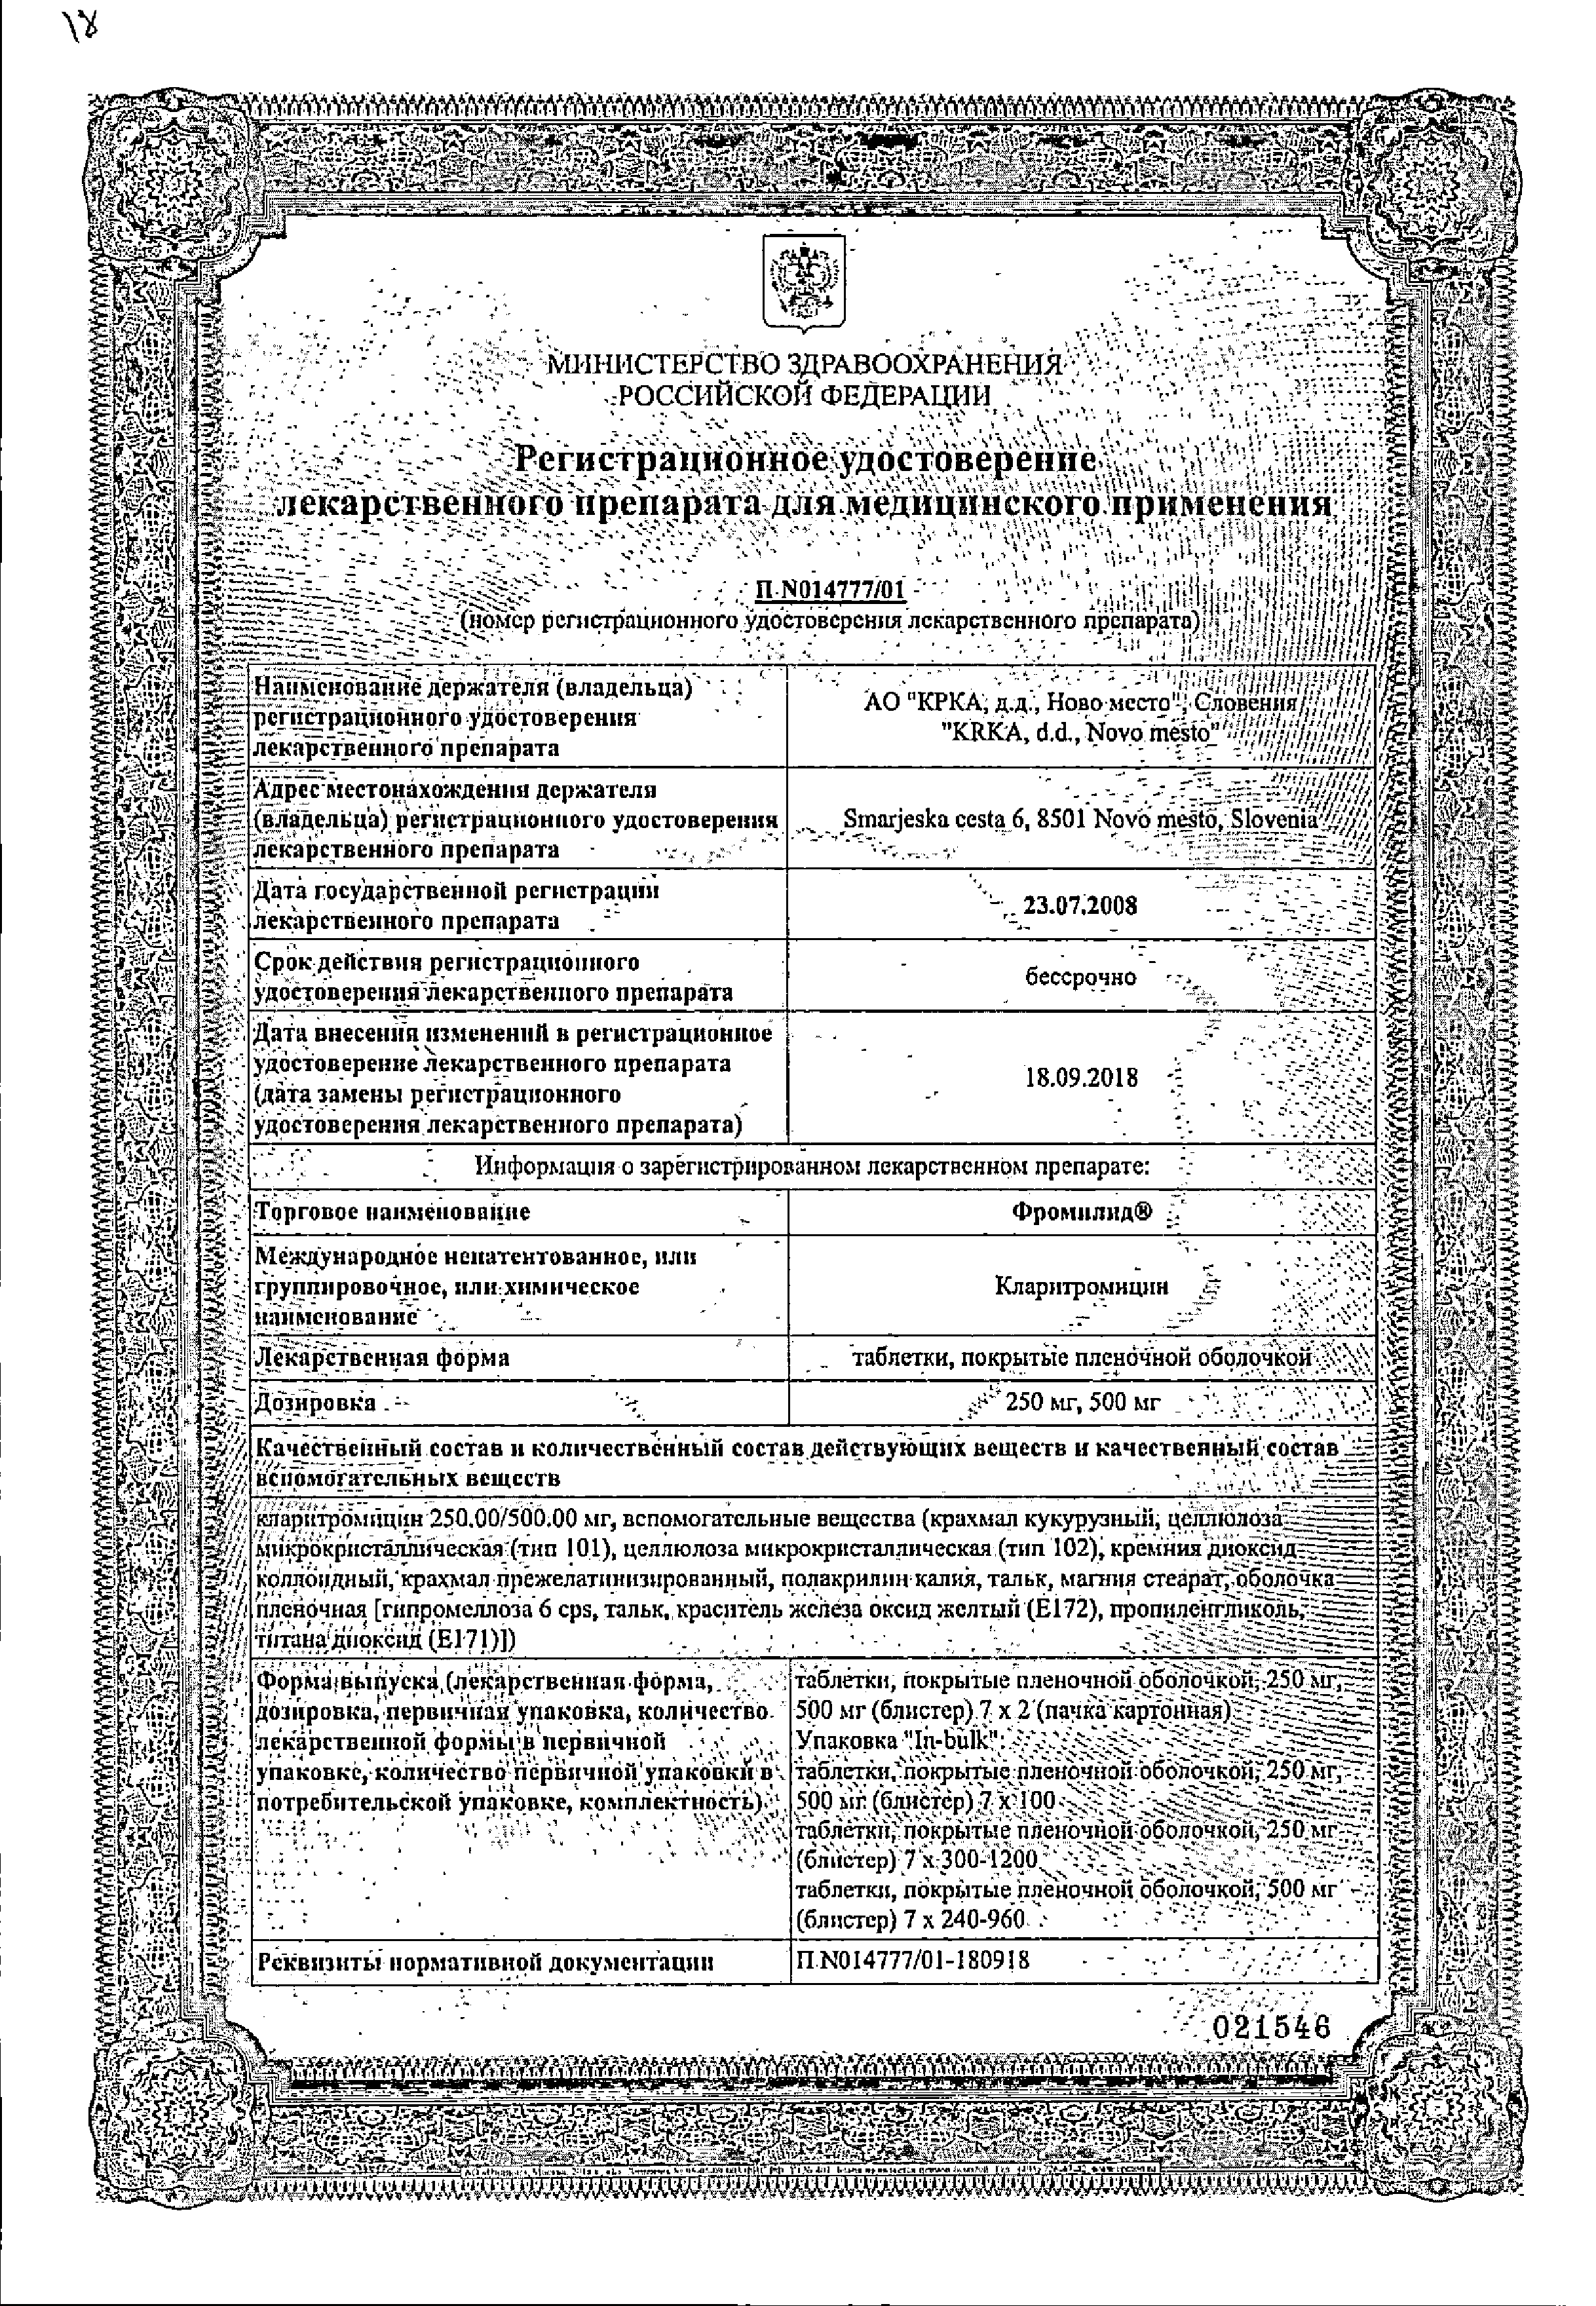 Фромилид сертификат